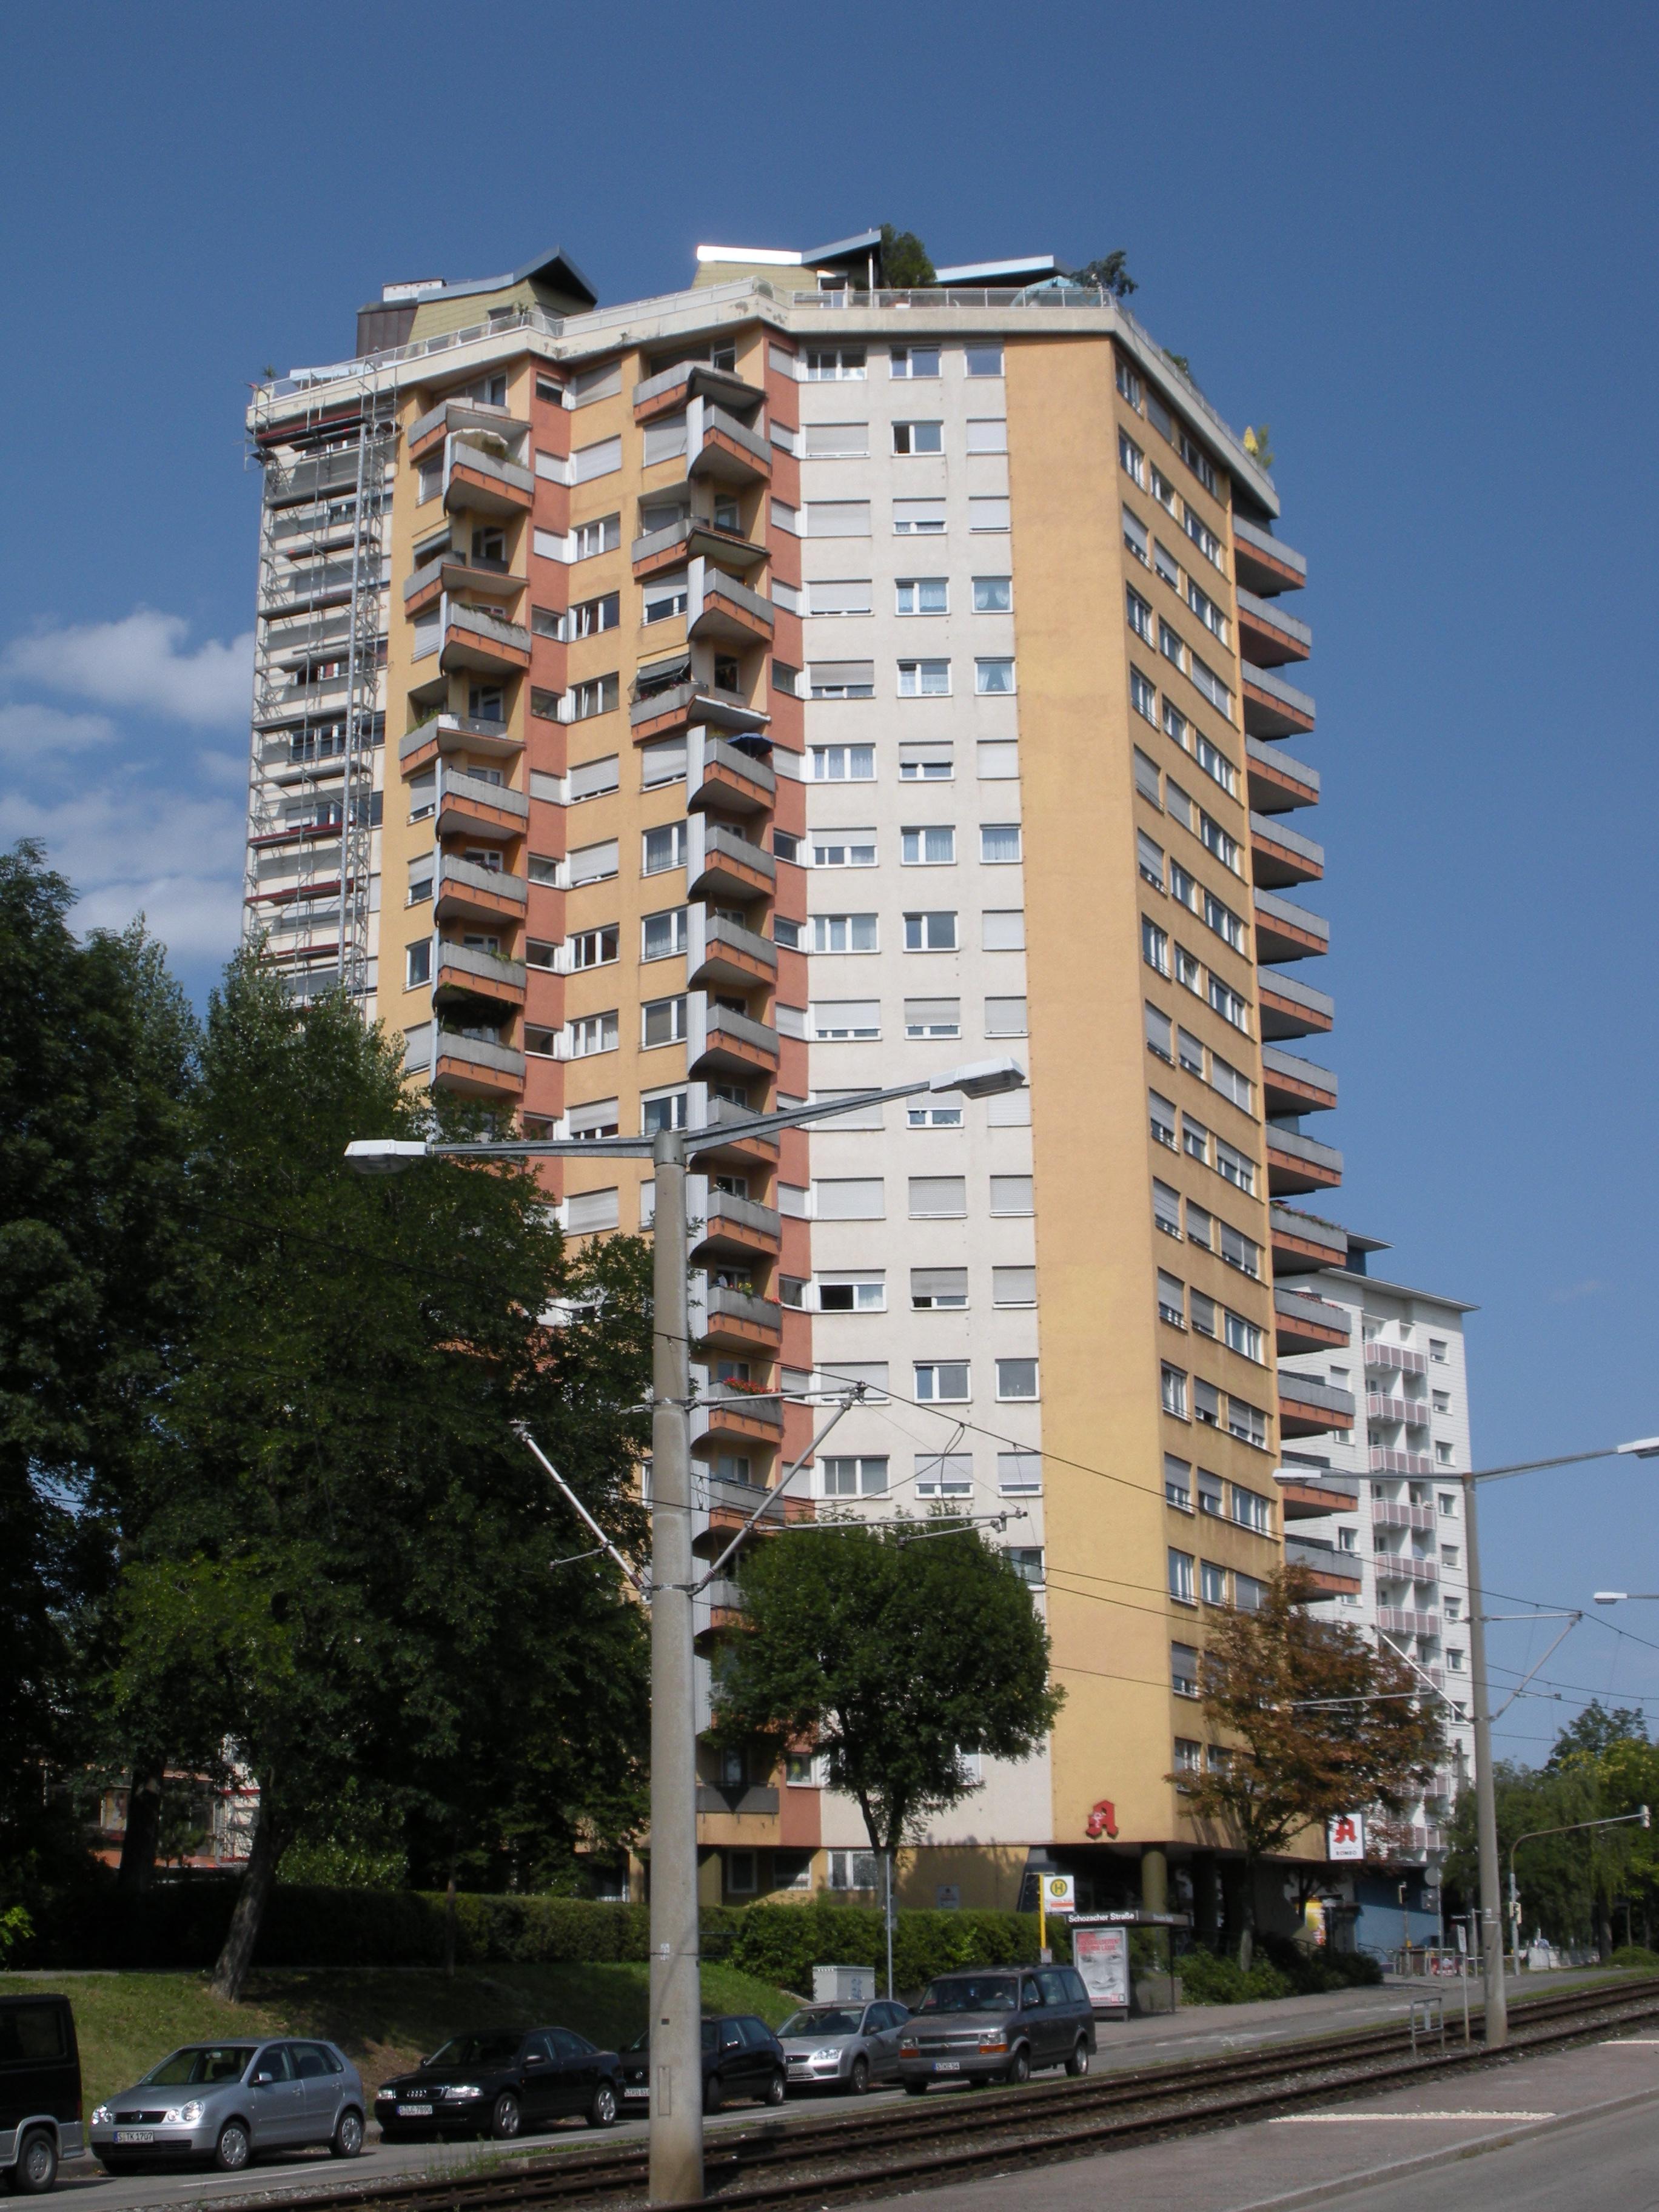 Description stuttgart hochhaus romeo zuff rot jpg